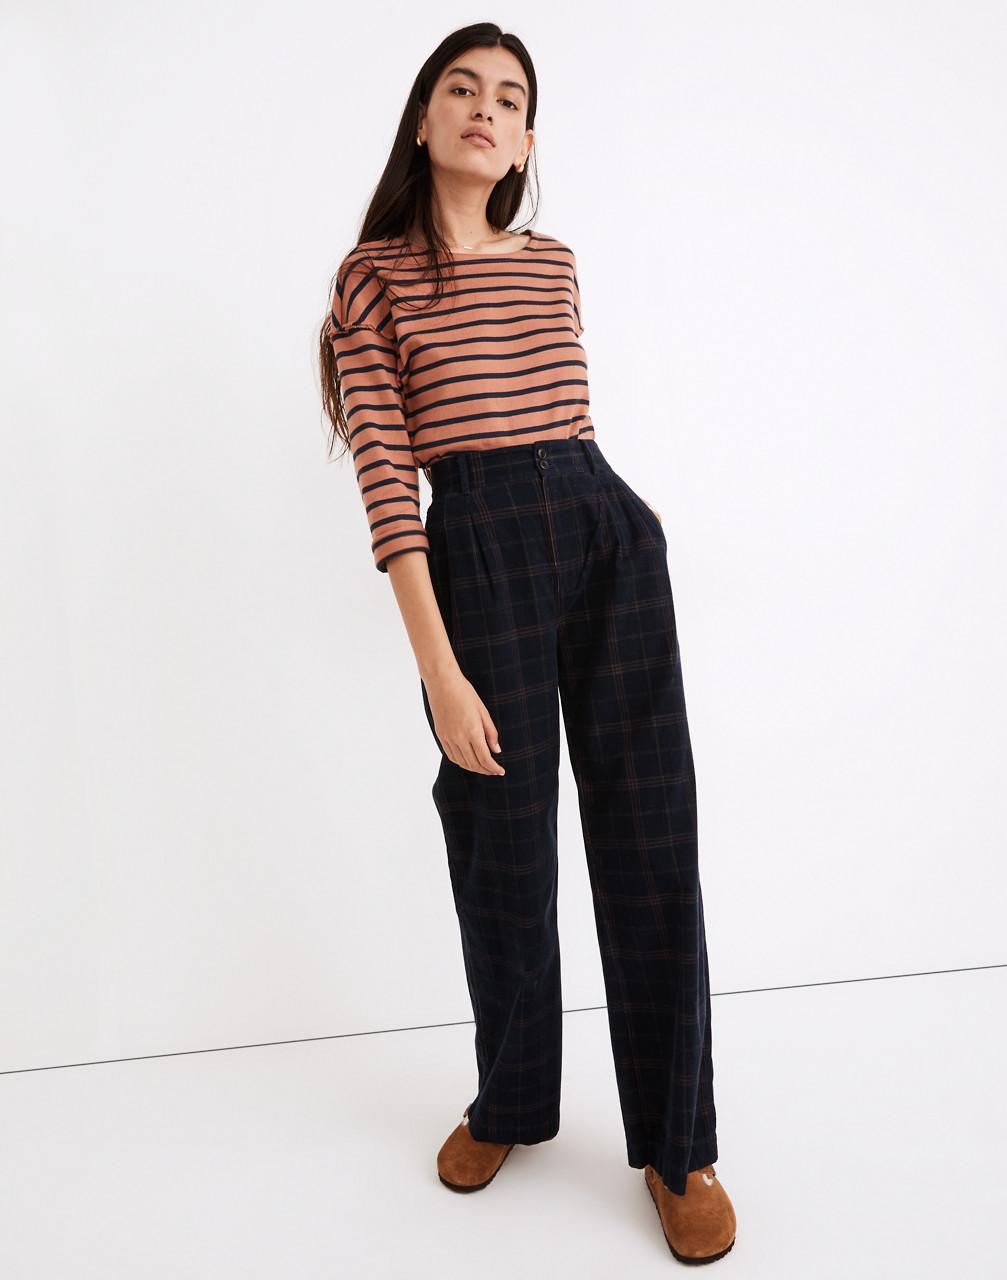 60s Pants, Jeans, Hippie, Flares, Jumpsuits Corduroy Pleated Wide-Leg Pants in Windowpane $118.00 AT vintagedancer.com